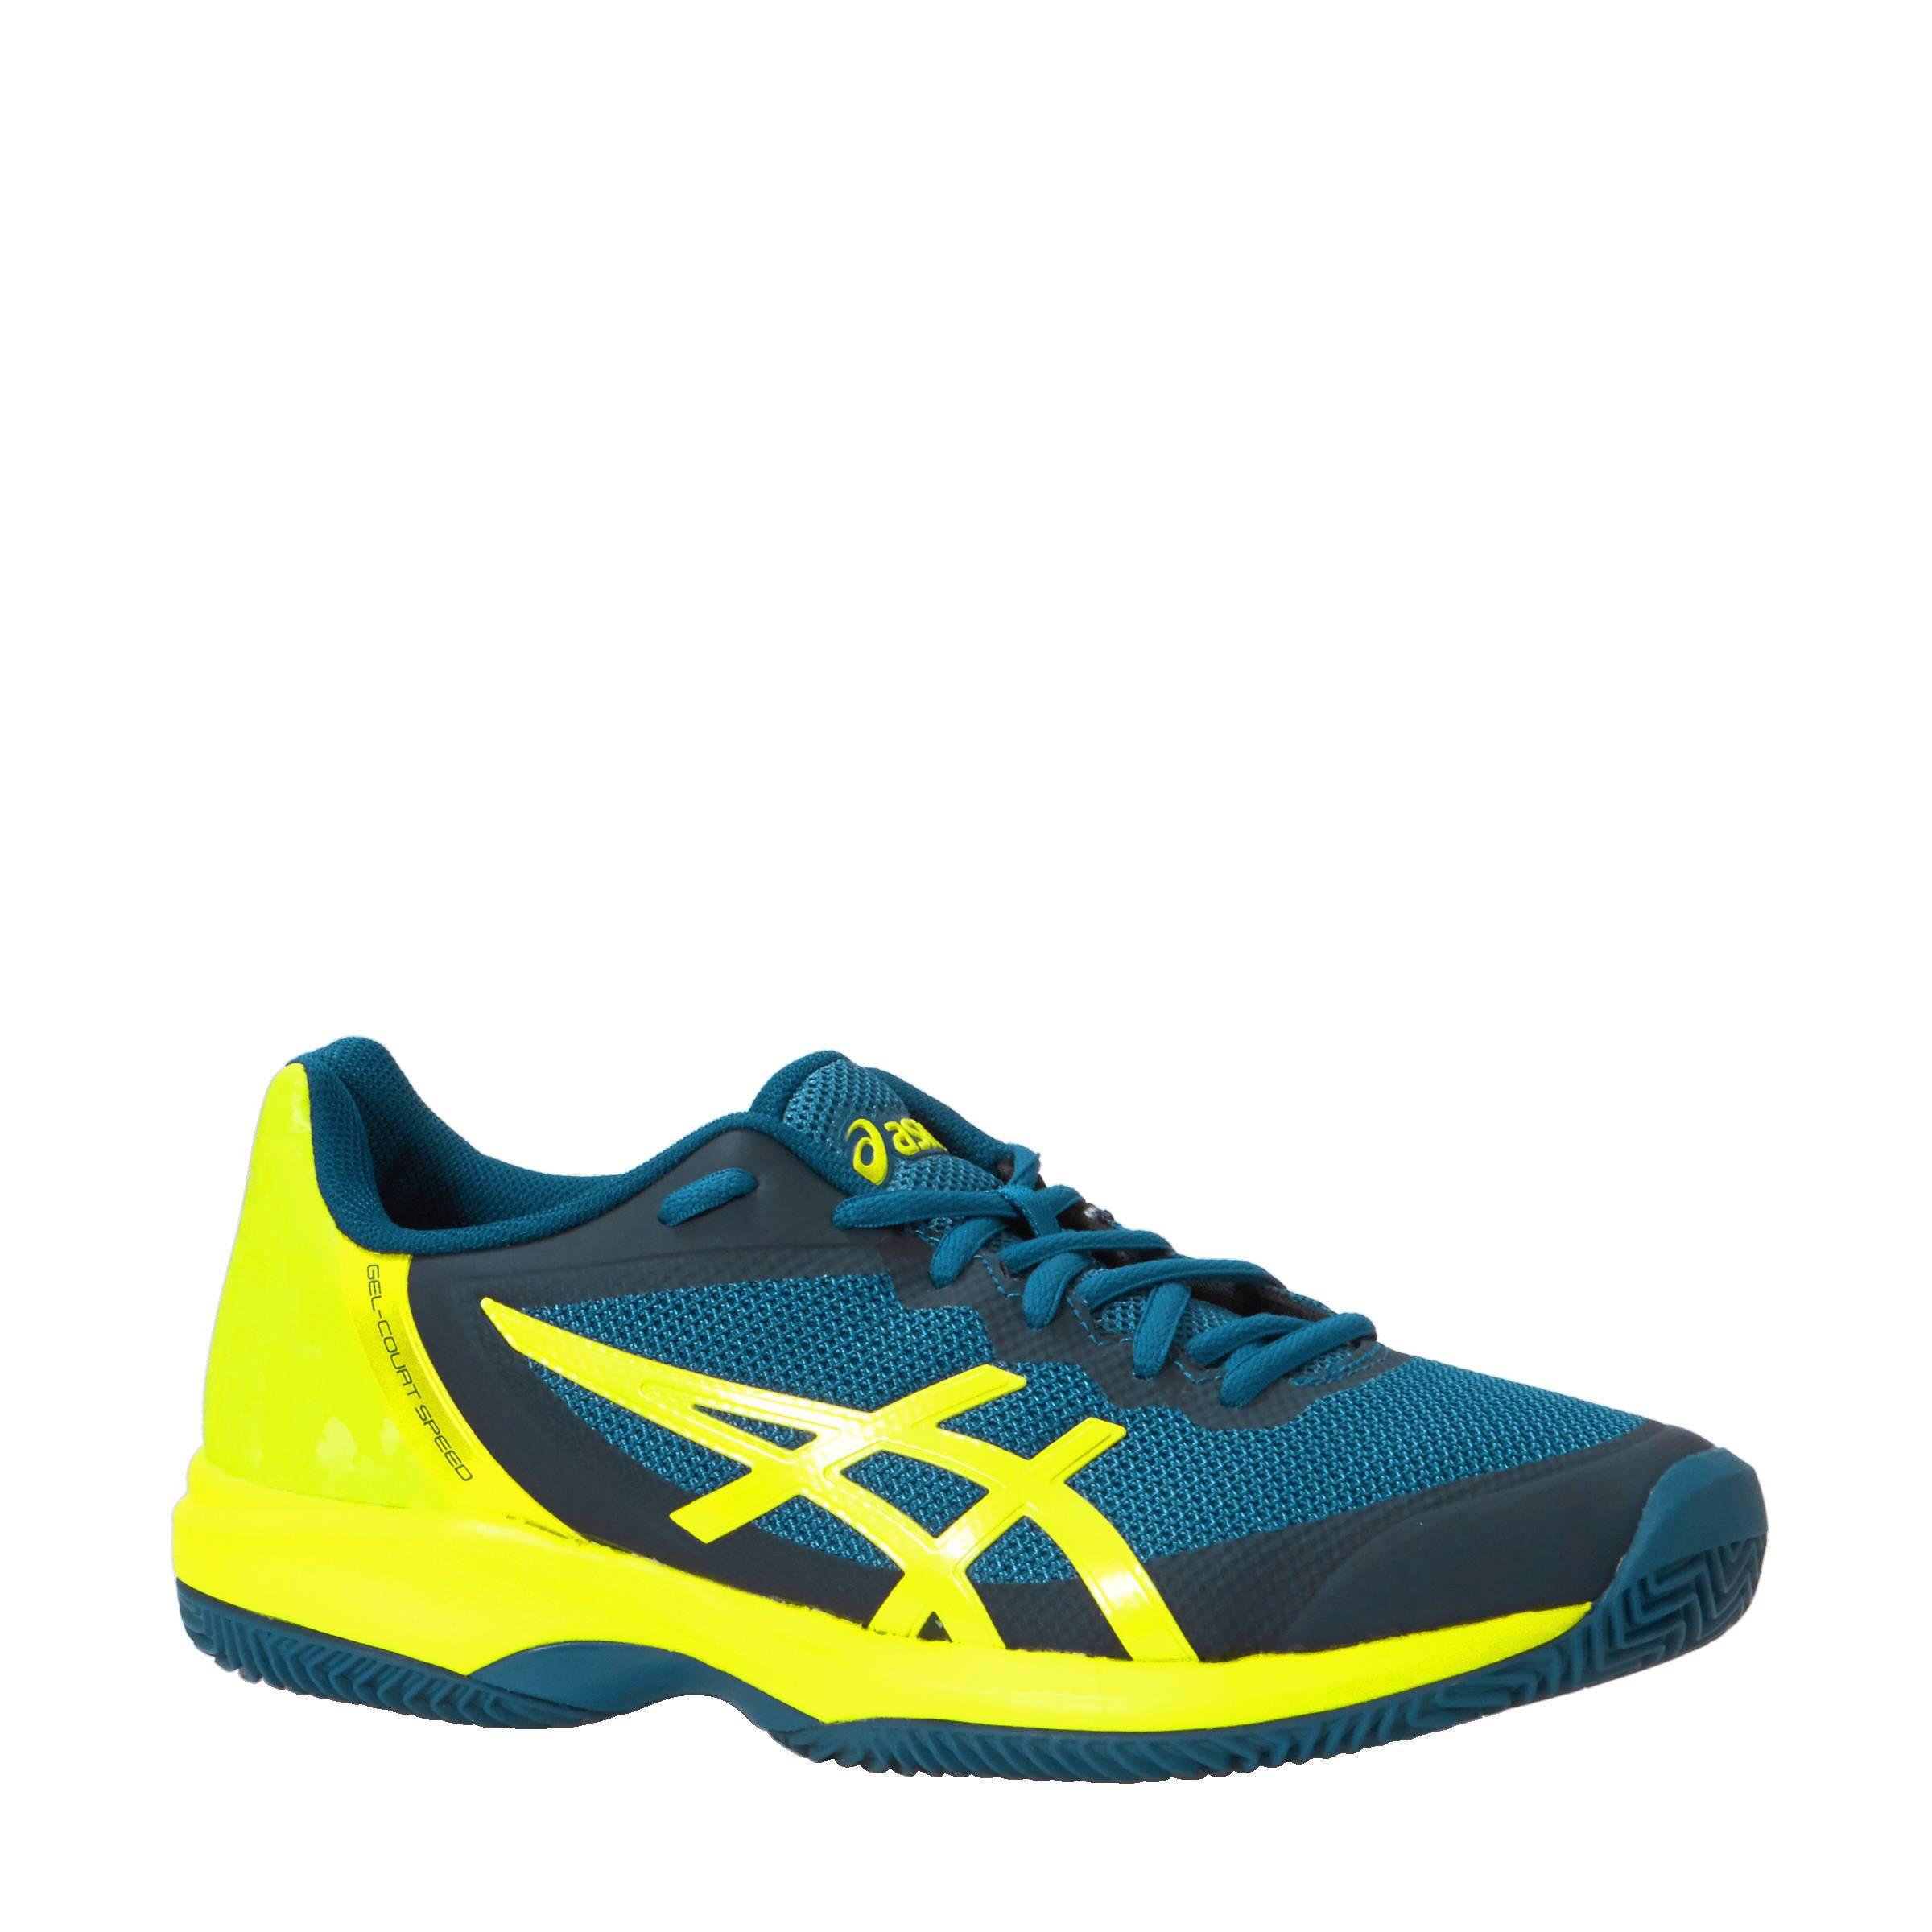 ASICS Gel Court Speed Clay tennisschoenen   wehkamp